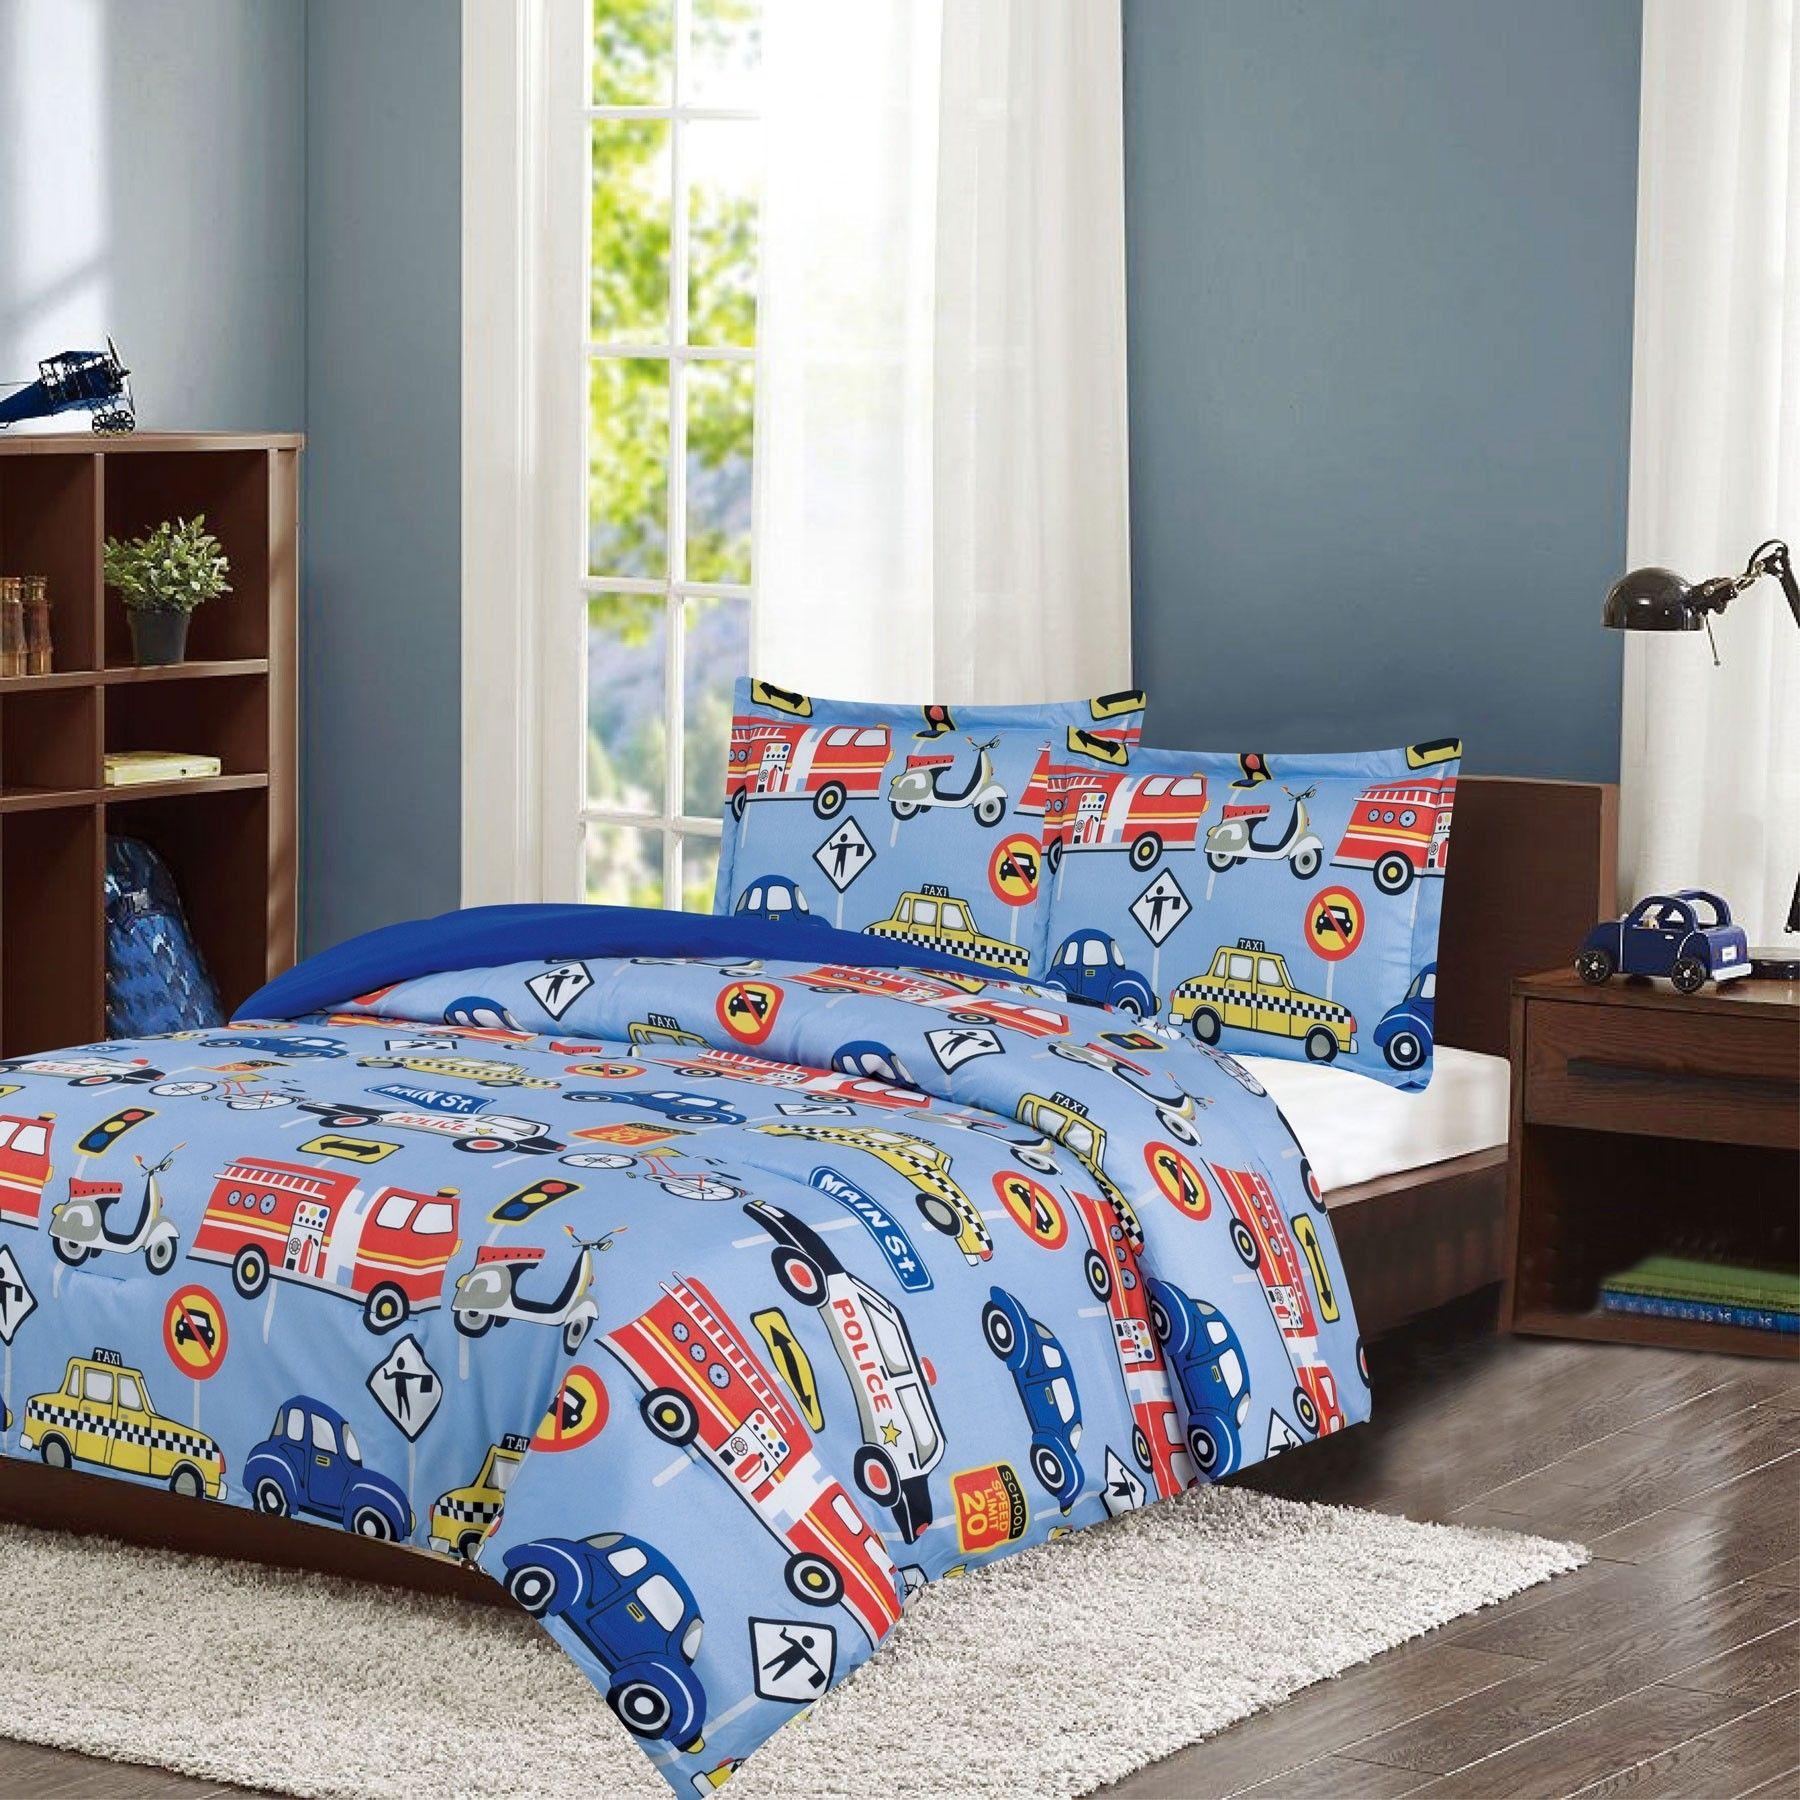 Crest Home Adore Twin 2 Pc Bedding Comforter Set Boys Cars Trucks